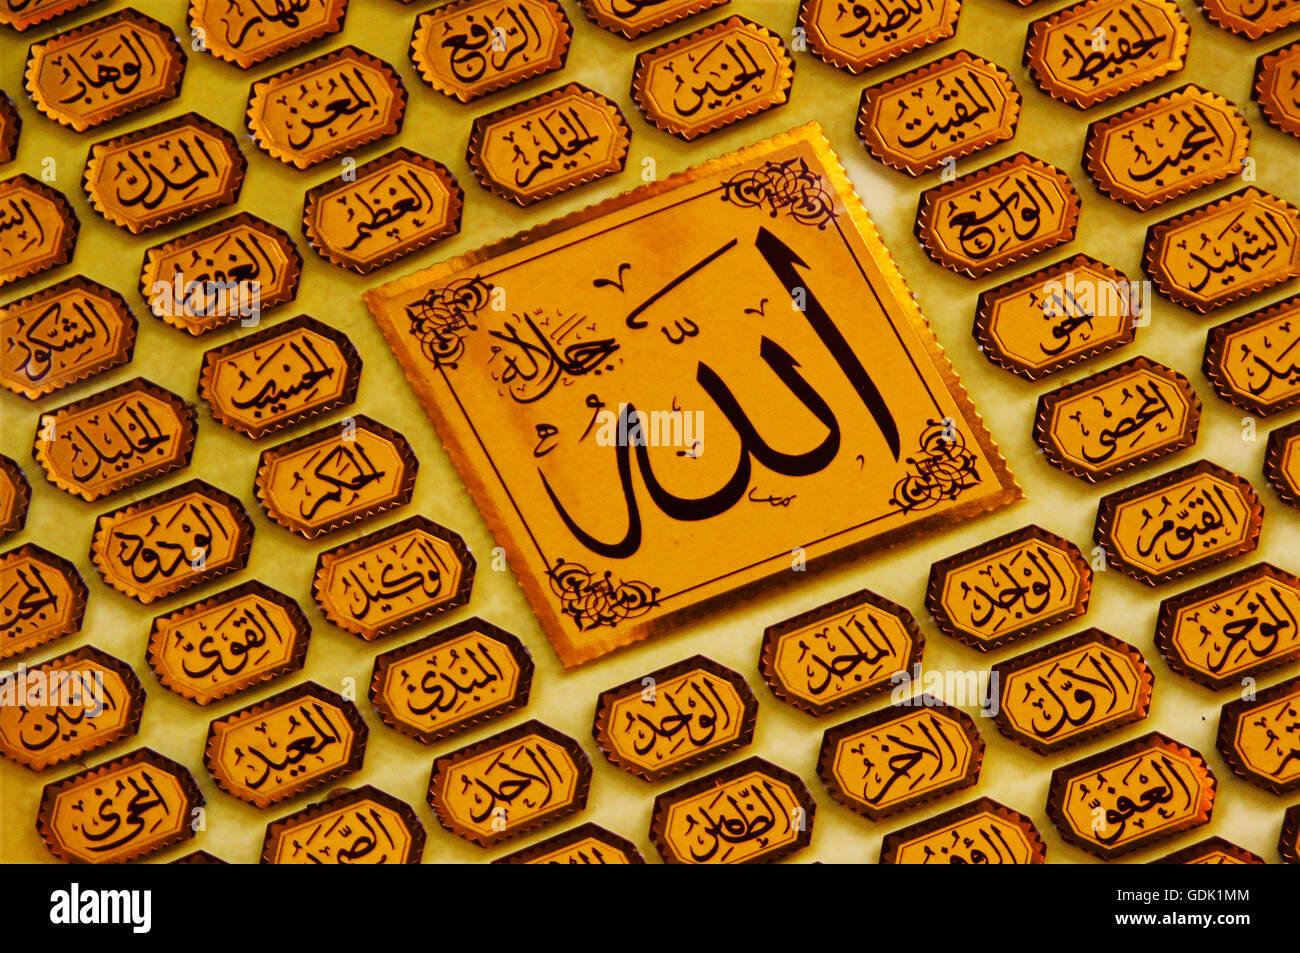 Some Of The 99 Names Allah In Religion Islam Anatolia Turkey